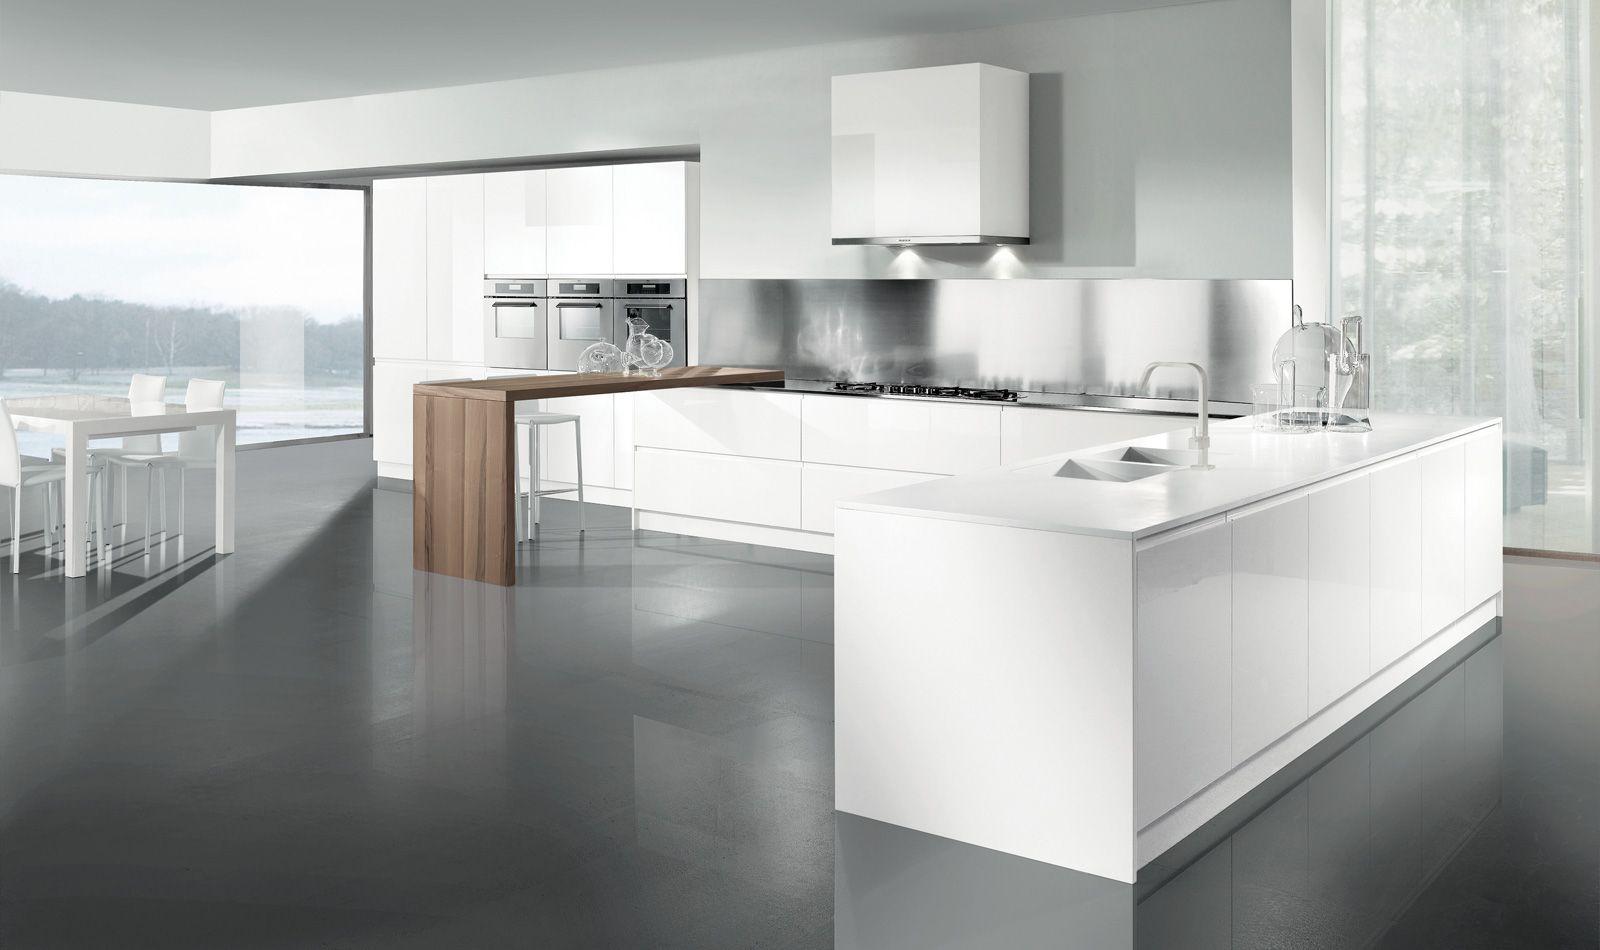 Redoitcucinemodernewegaml white kitchen